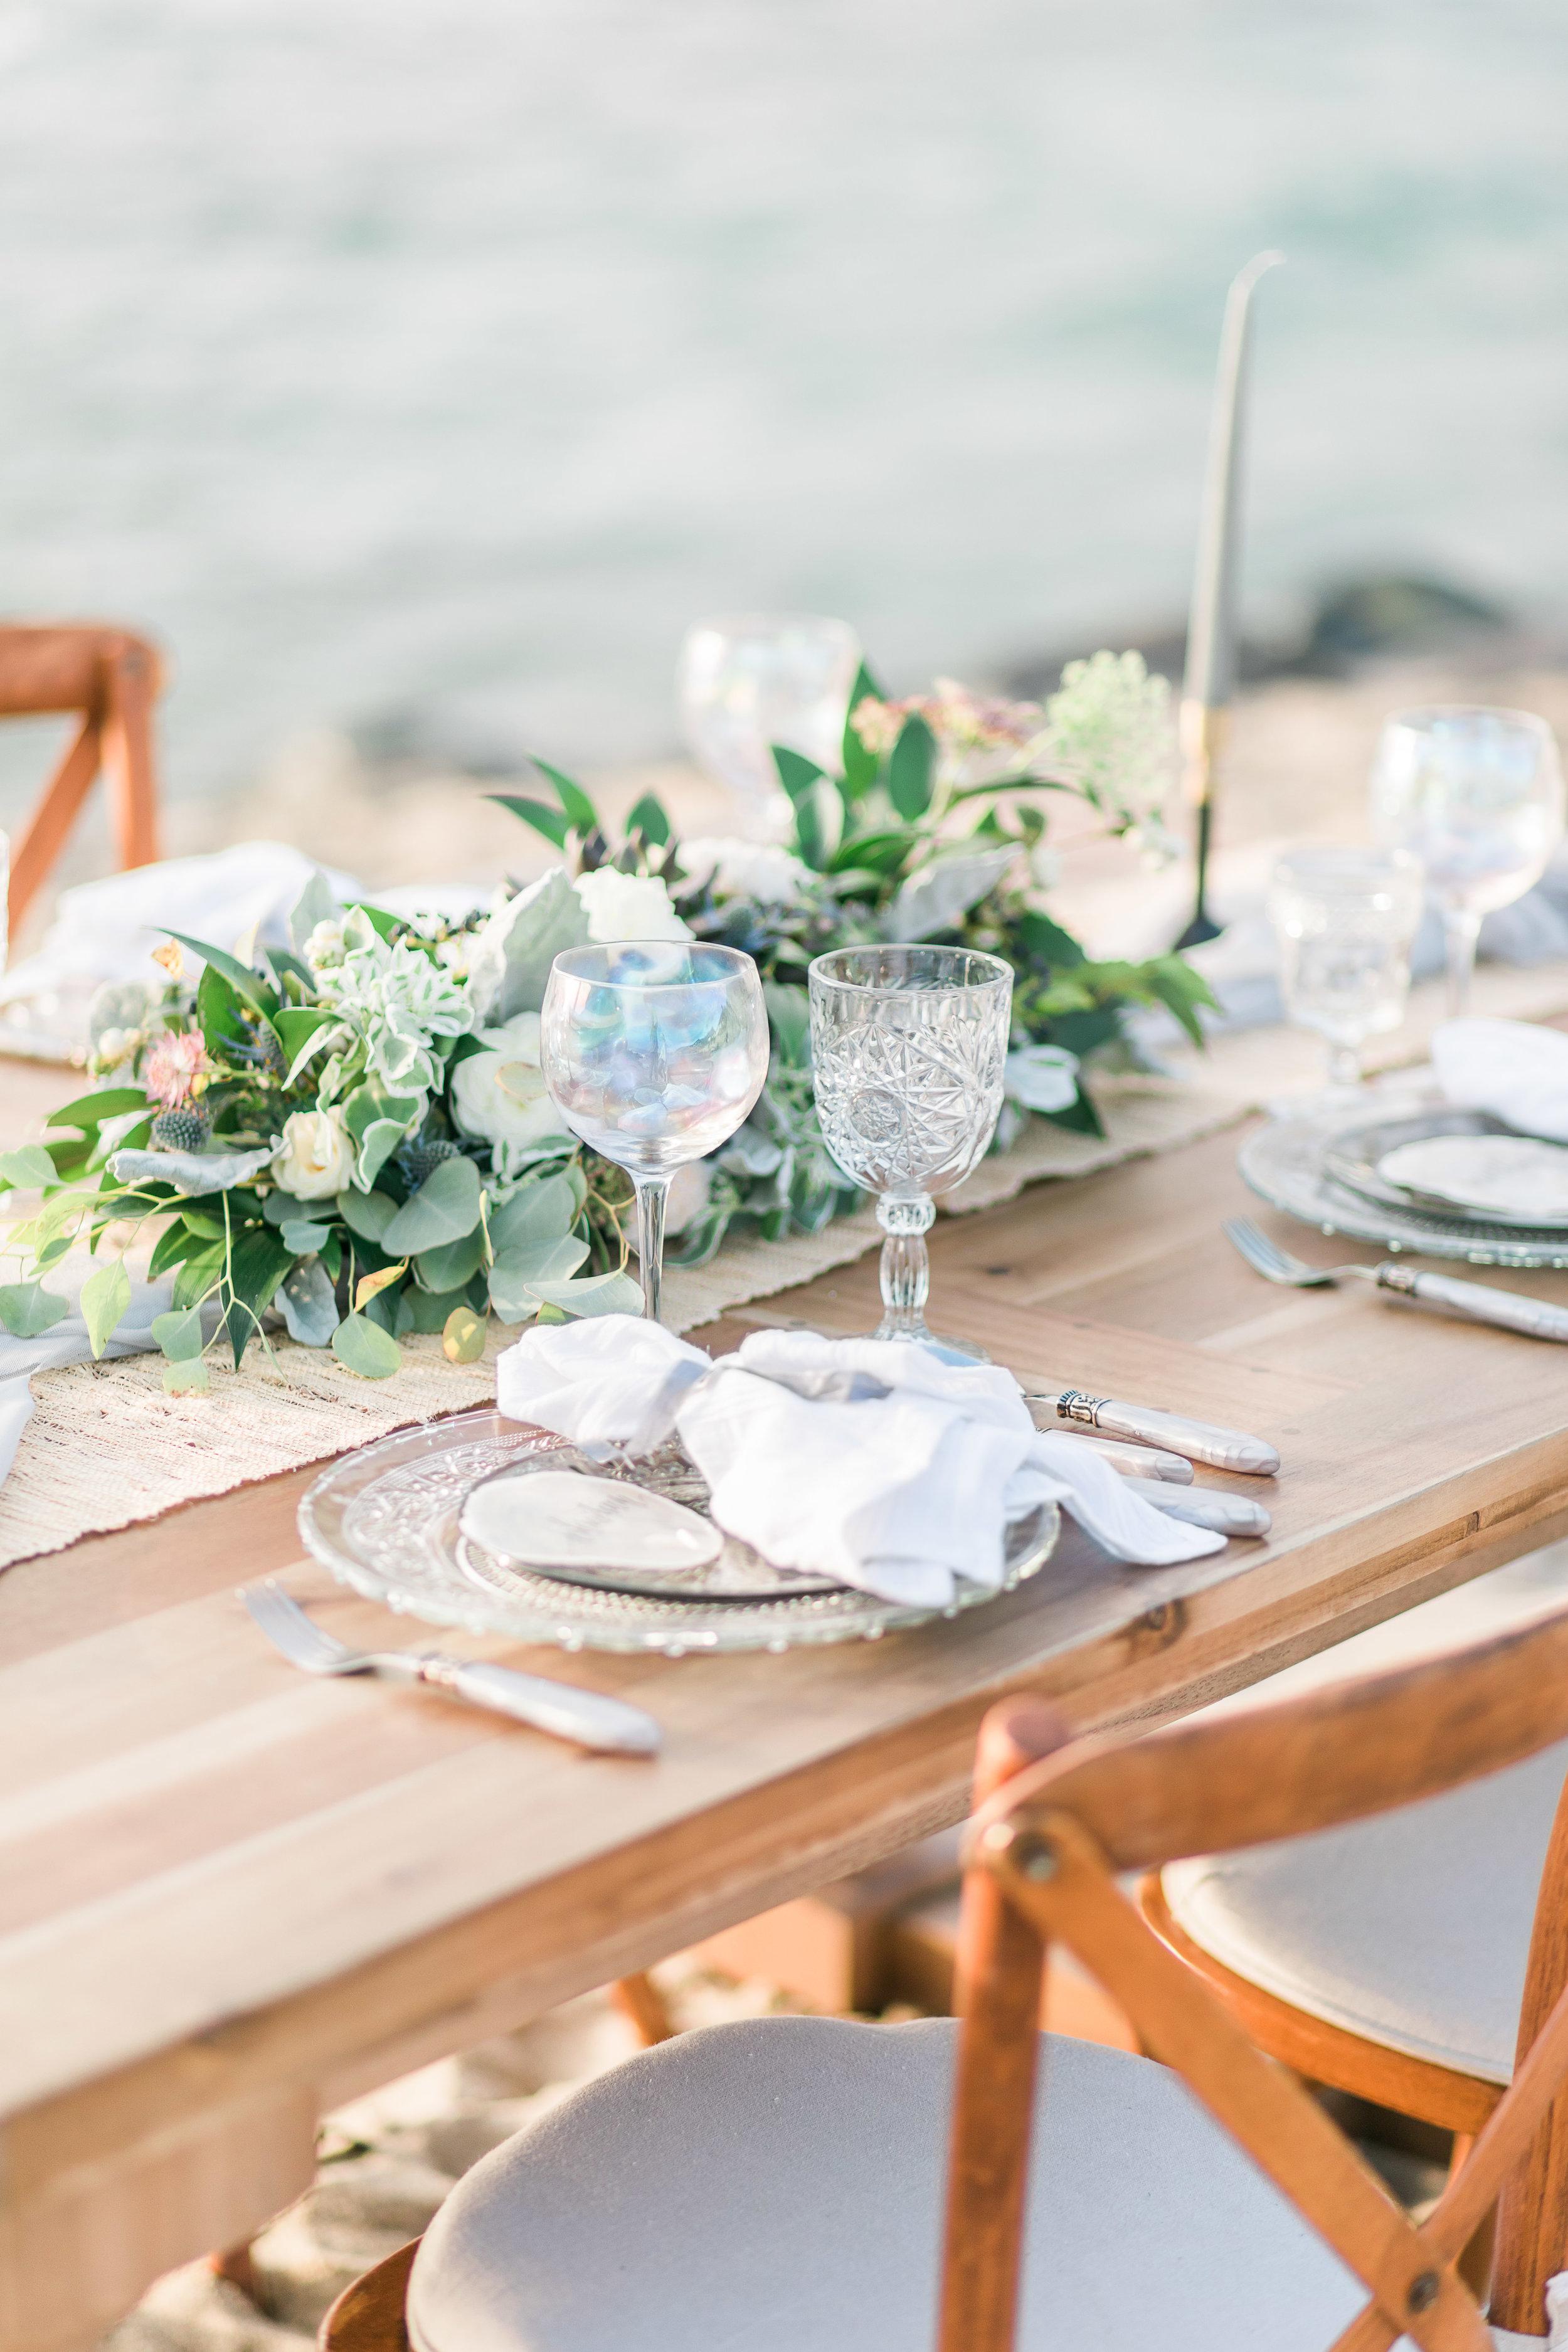 LA-Wedding-Shoot-by-JBJ-Pictures-231.jpg